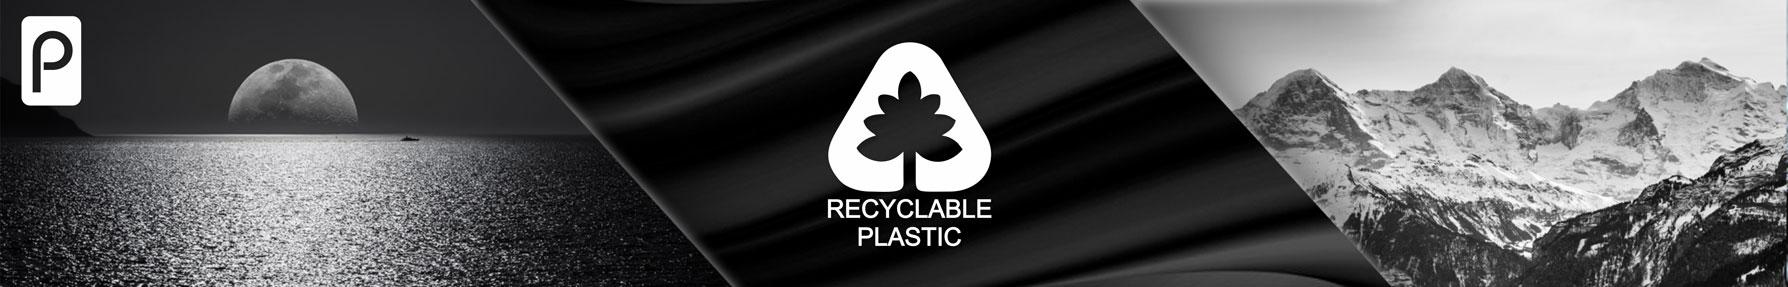 Matt Black plastic cards Premier Plastic Cards recyclable plastic cards